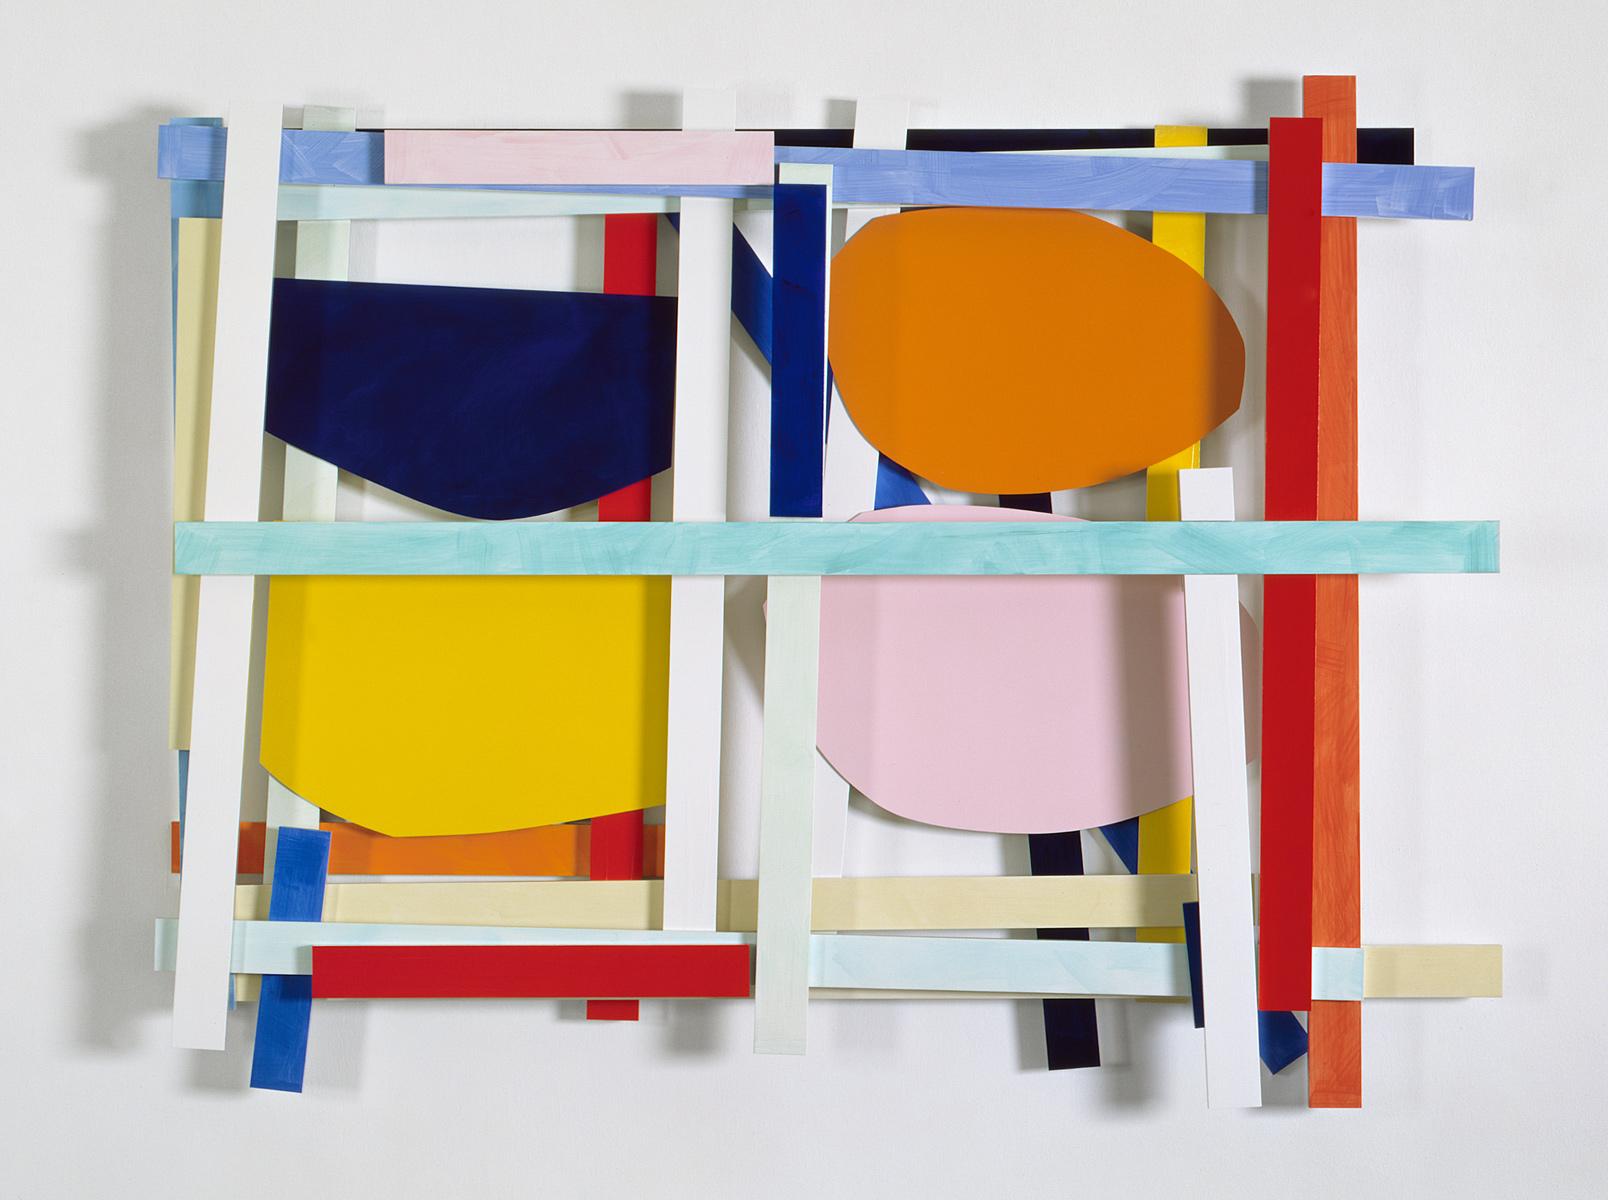 Imi Knoebel Vier Bilder Exhibitions Galerie B 228 Rbel